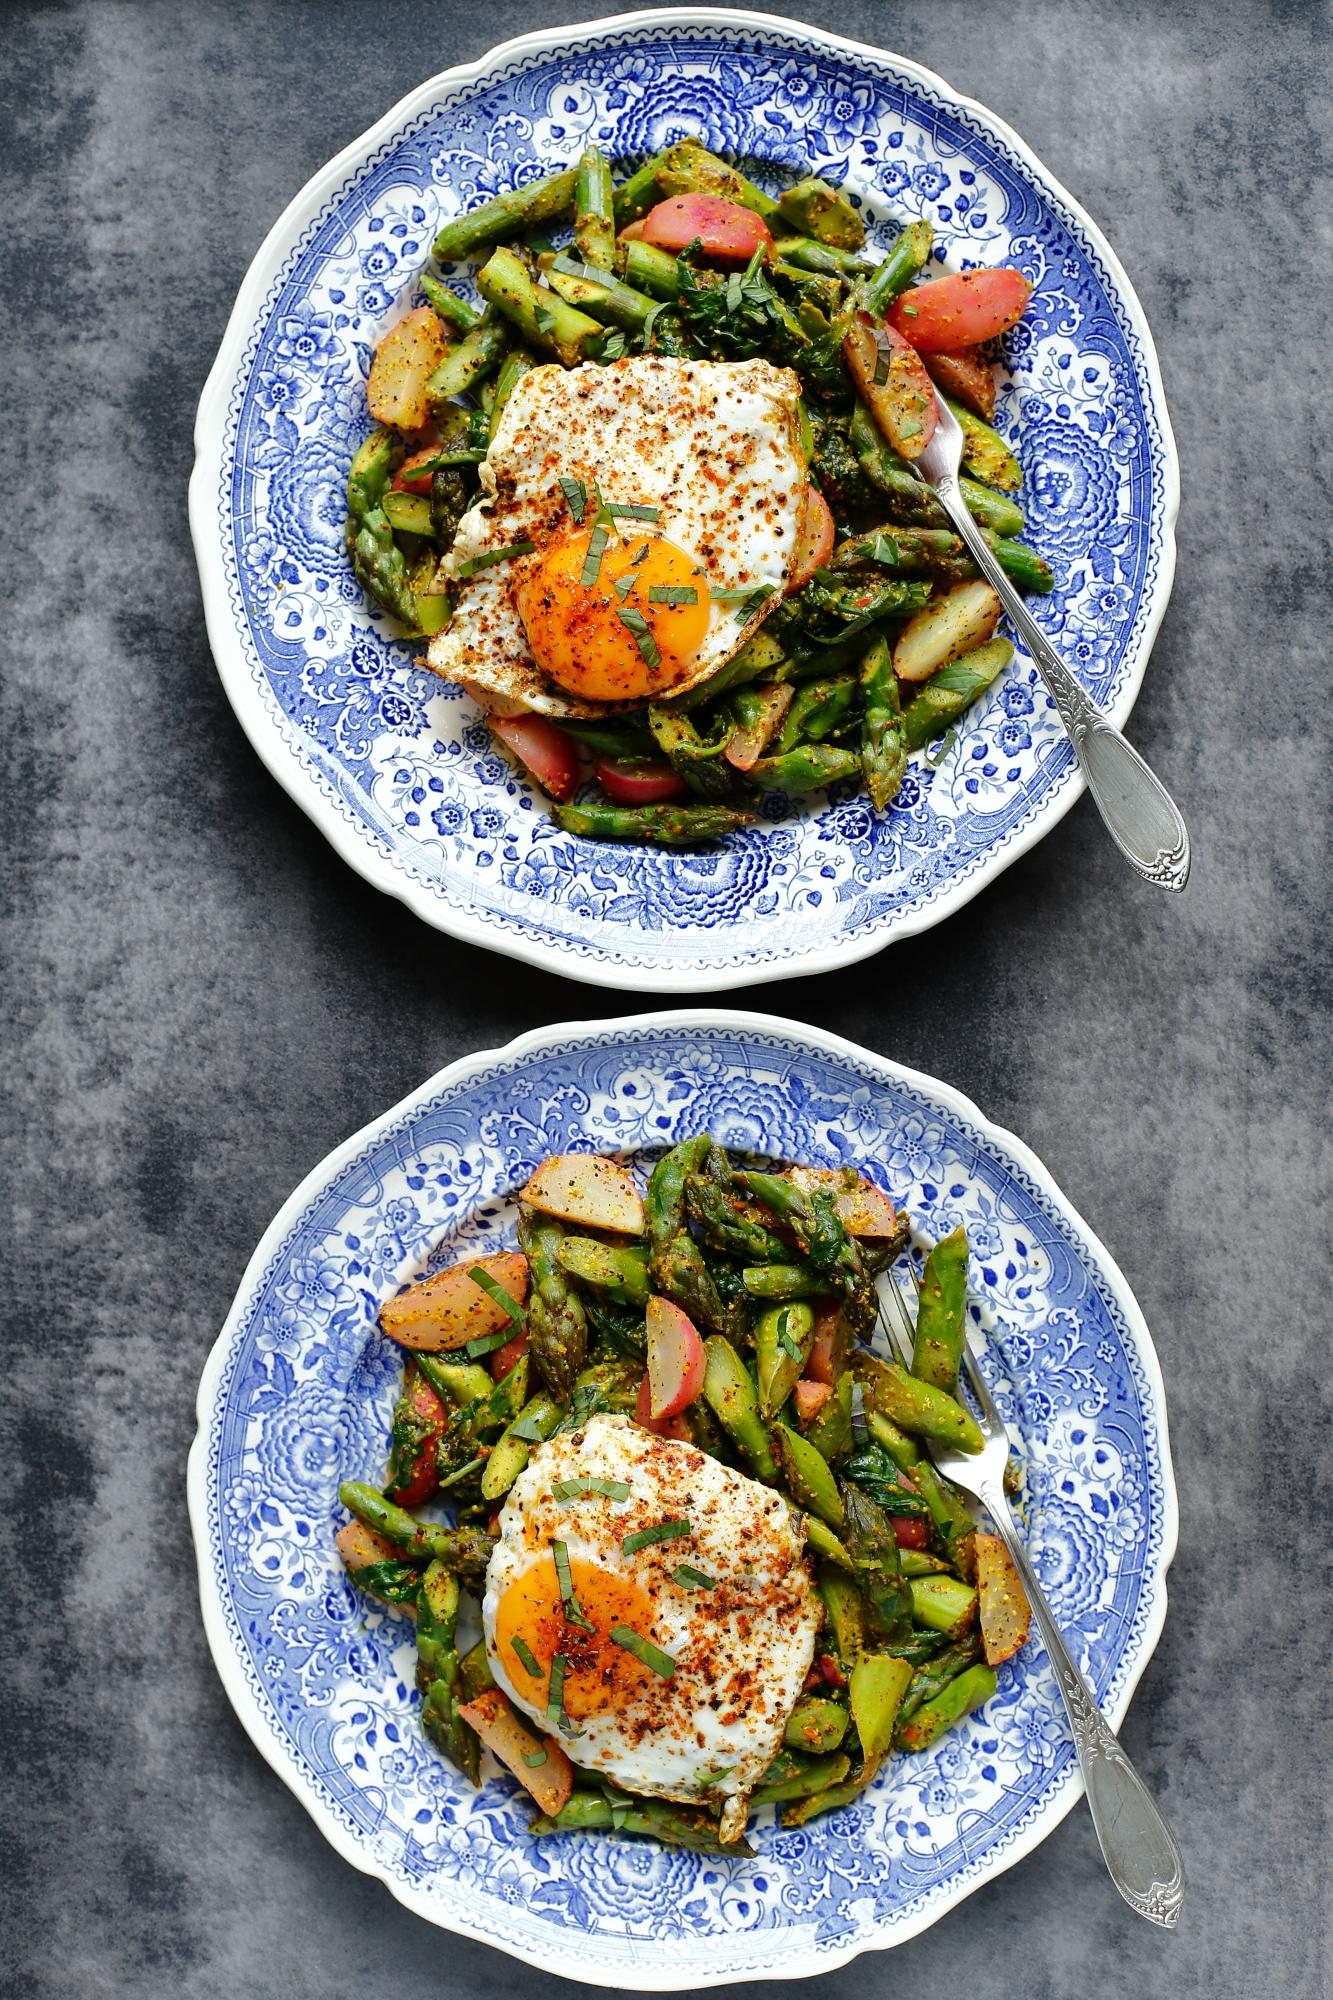 Szparagi z musztardą i jajkiem